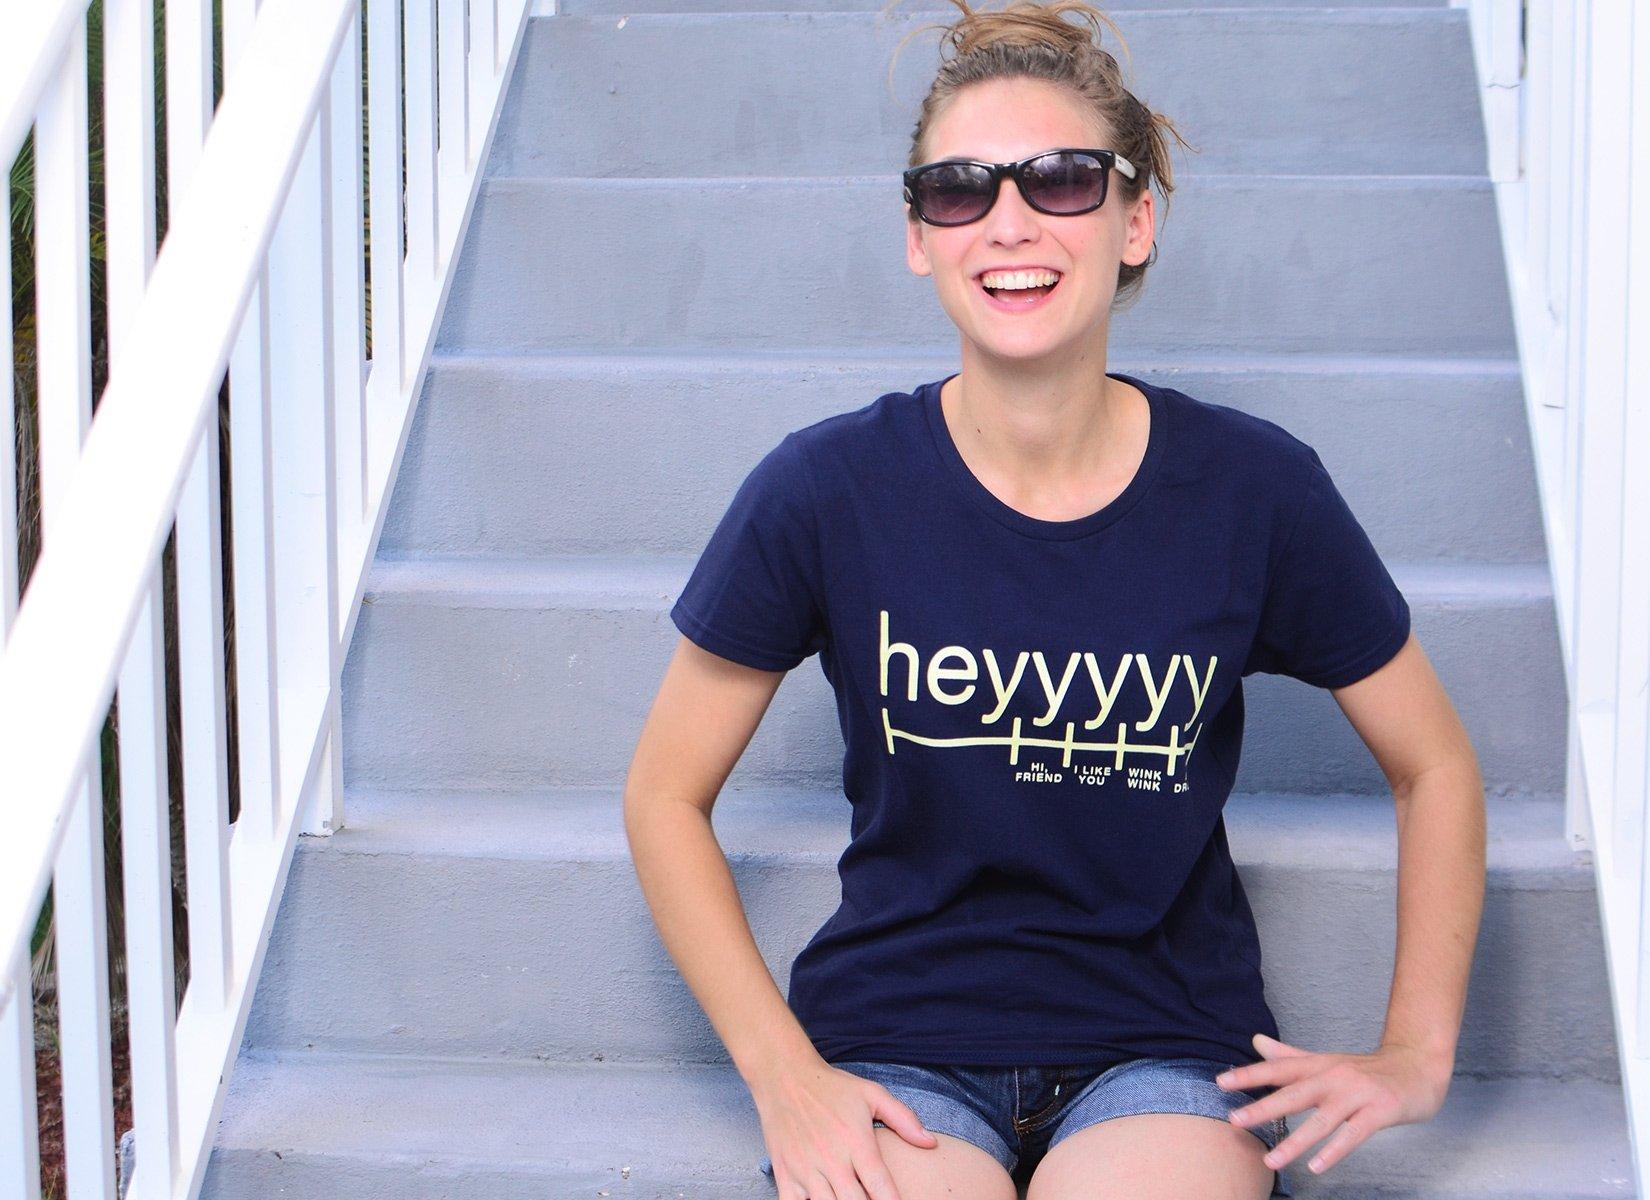 Heyyyyy on Womens T-Shirt